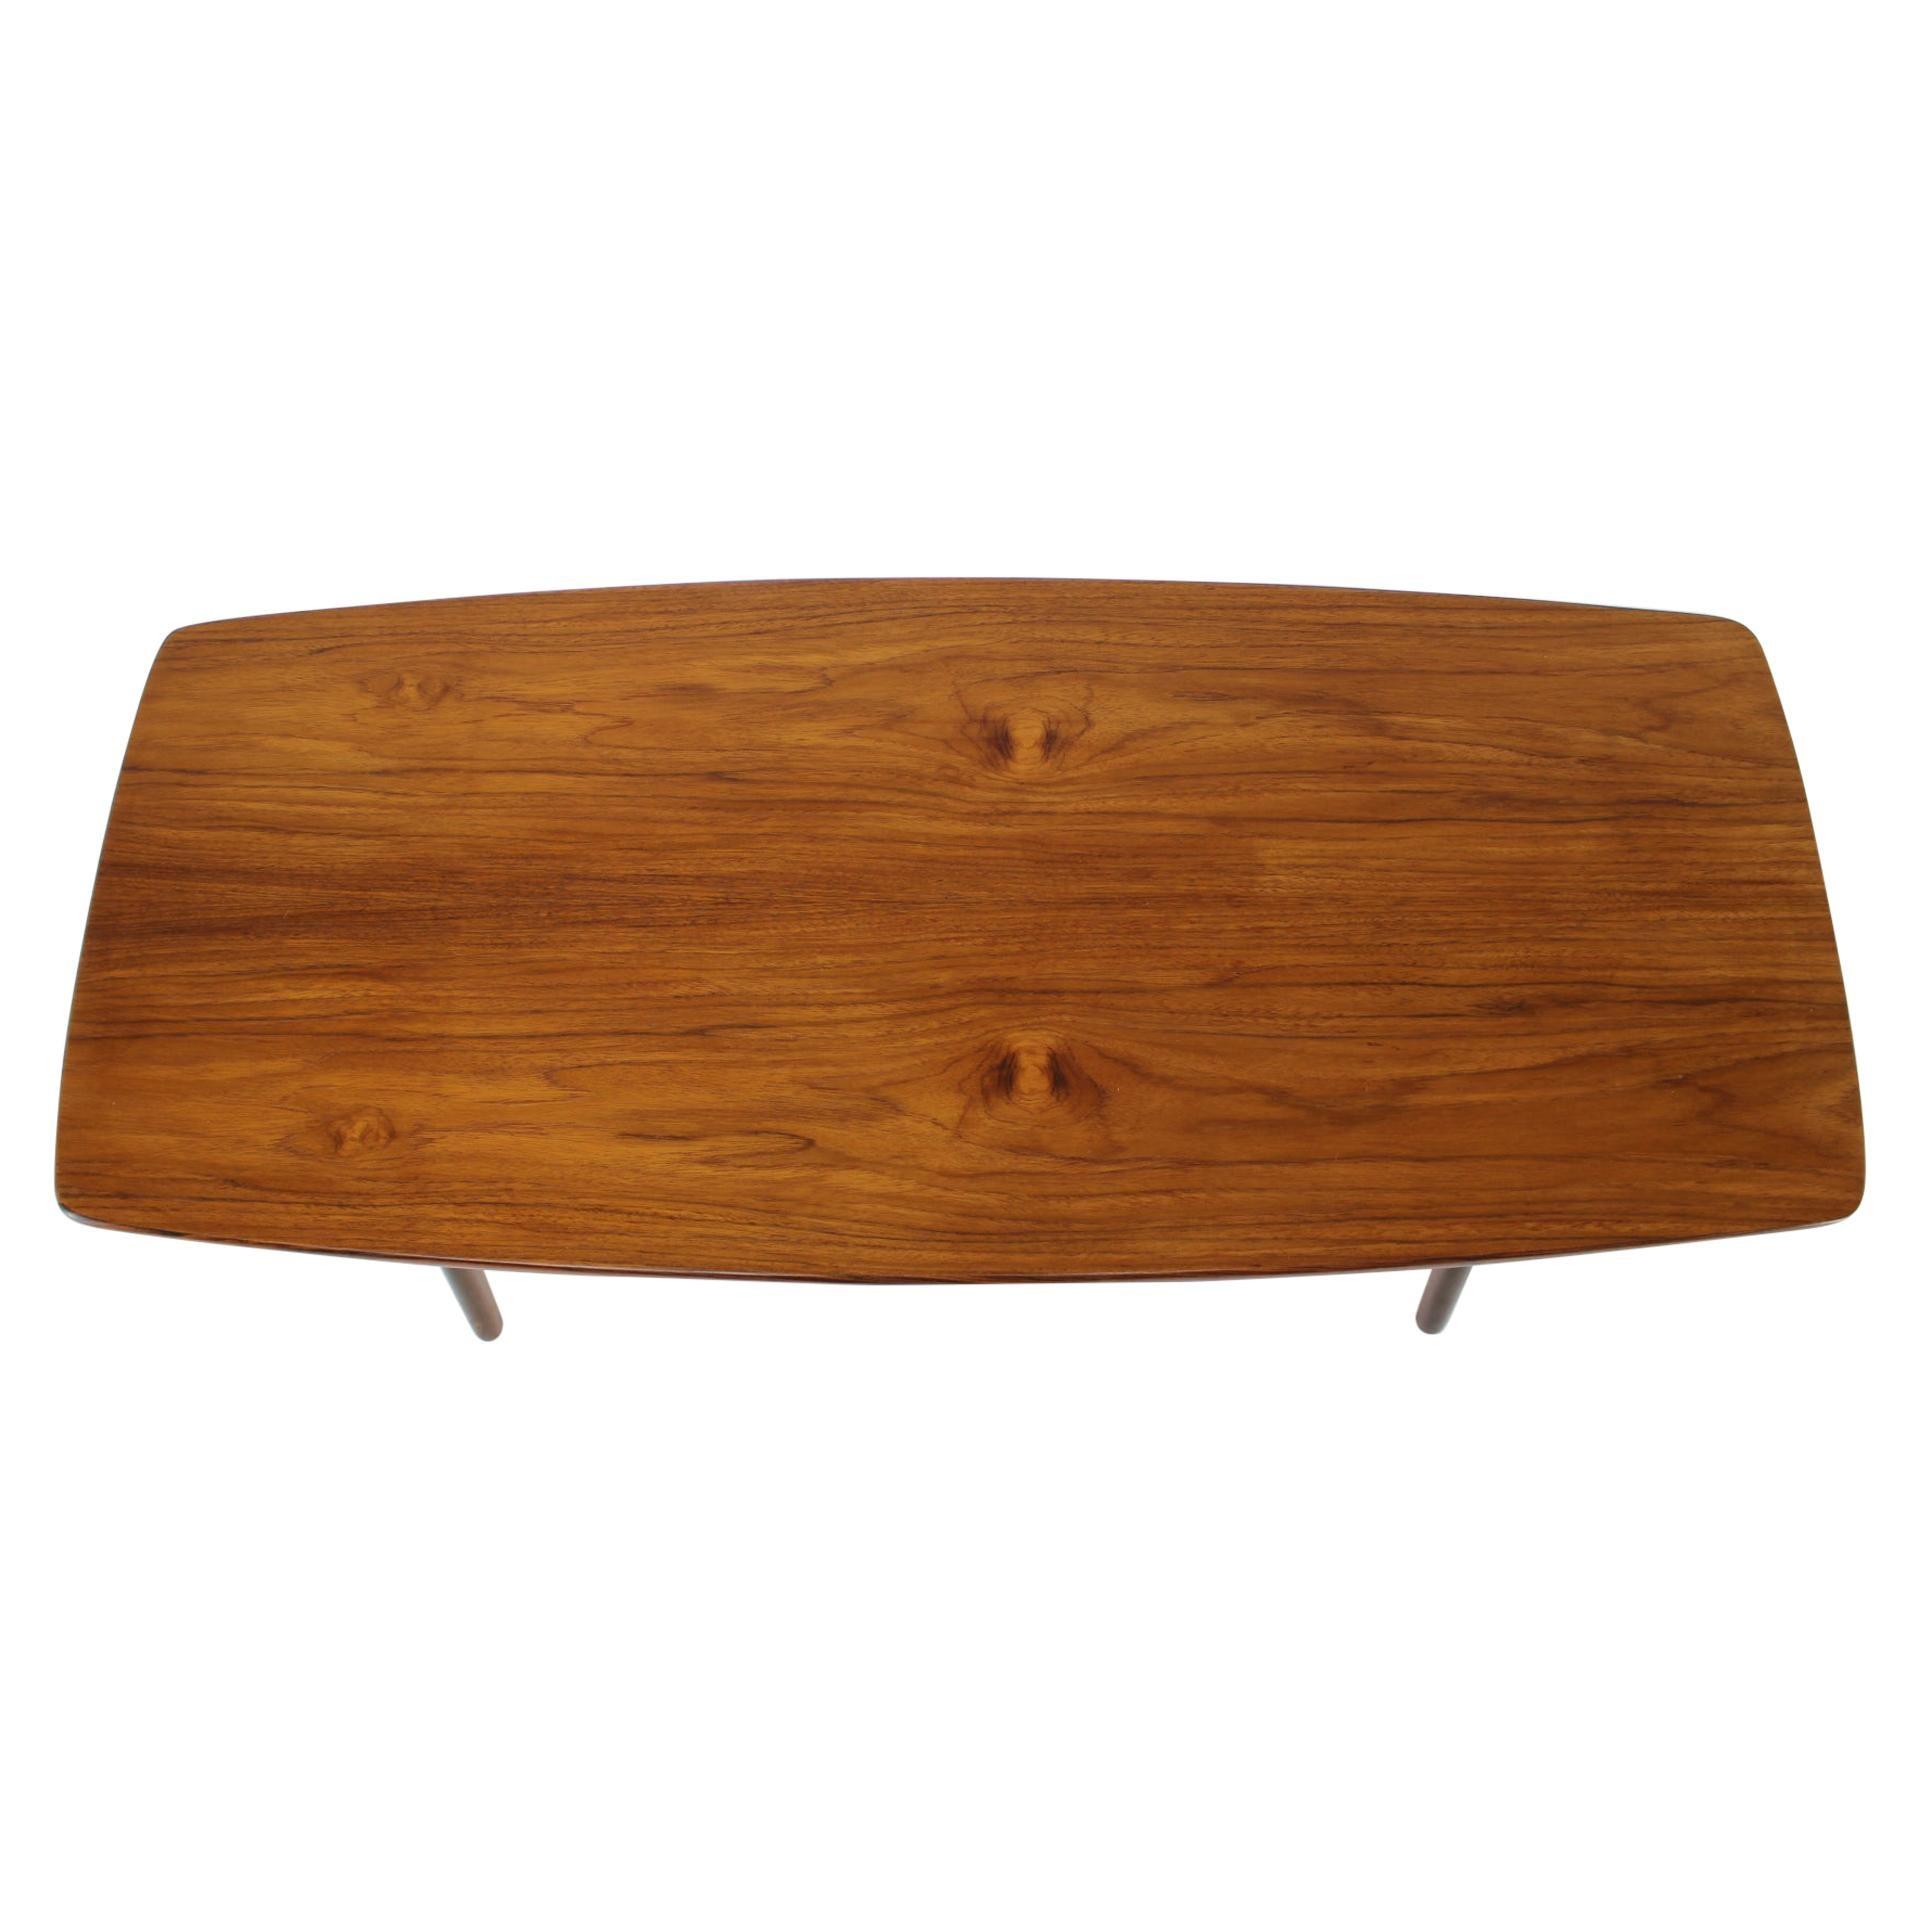 1960s Danish Teak Coffee Table